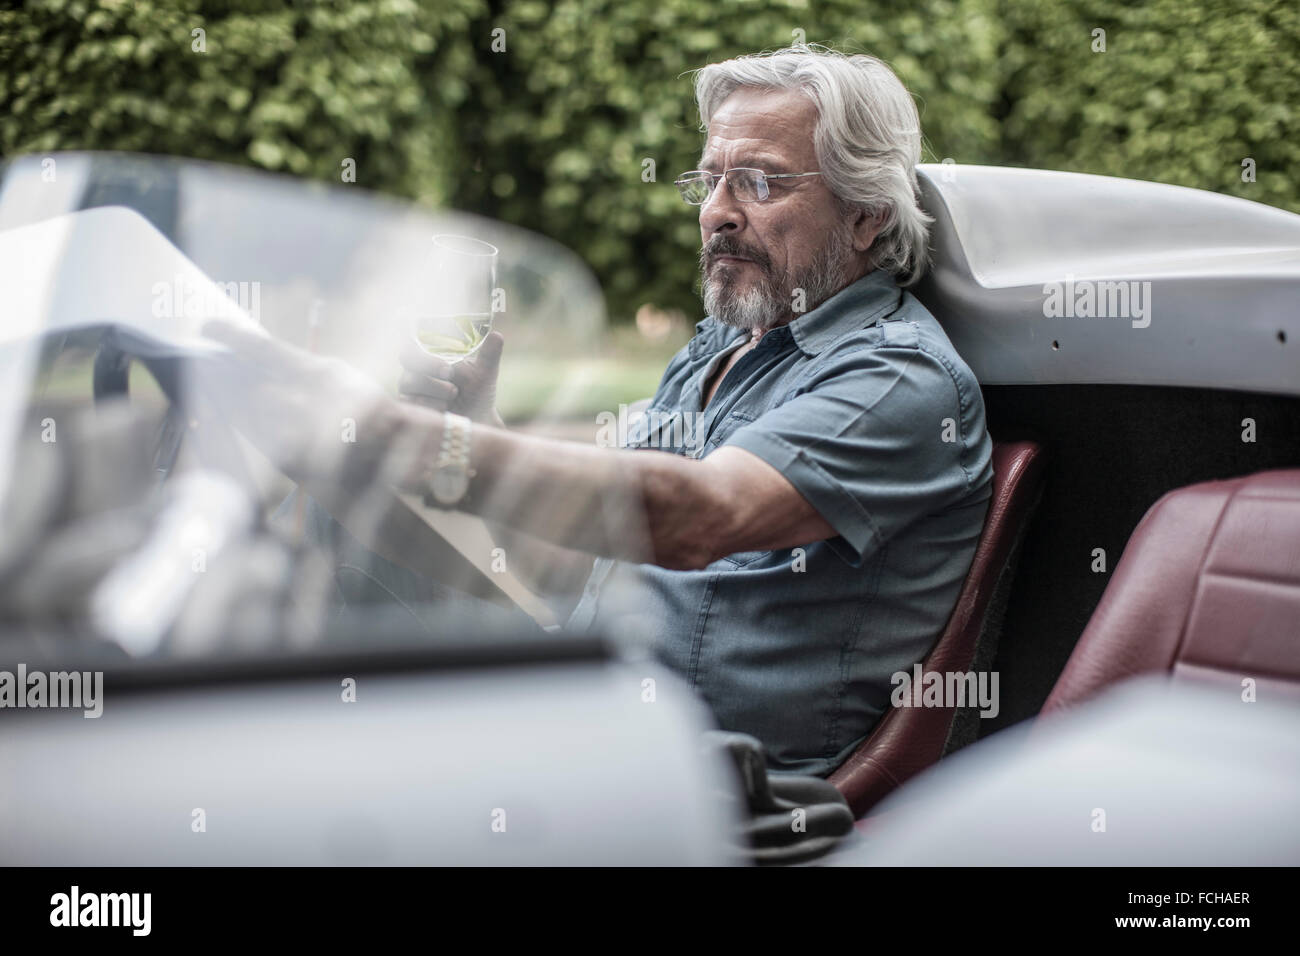 Senior man in sports car looking at check list drinking lemonade - Stock Image